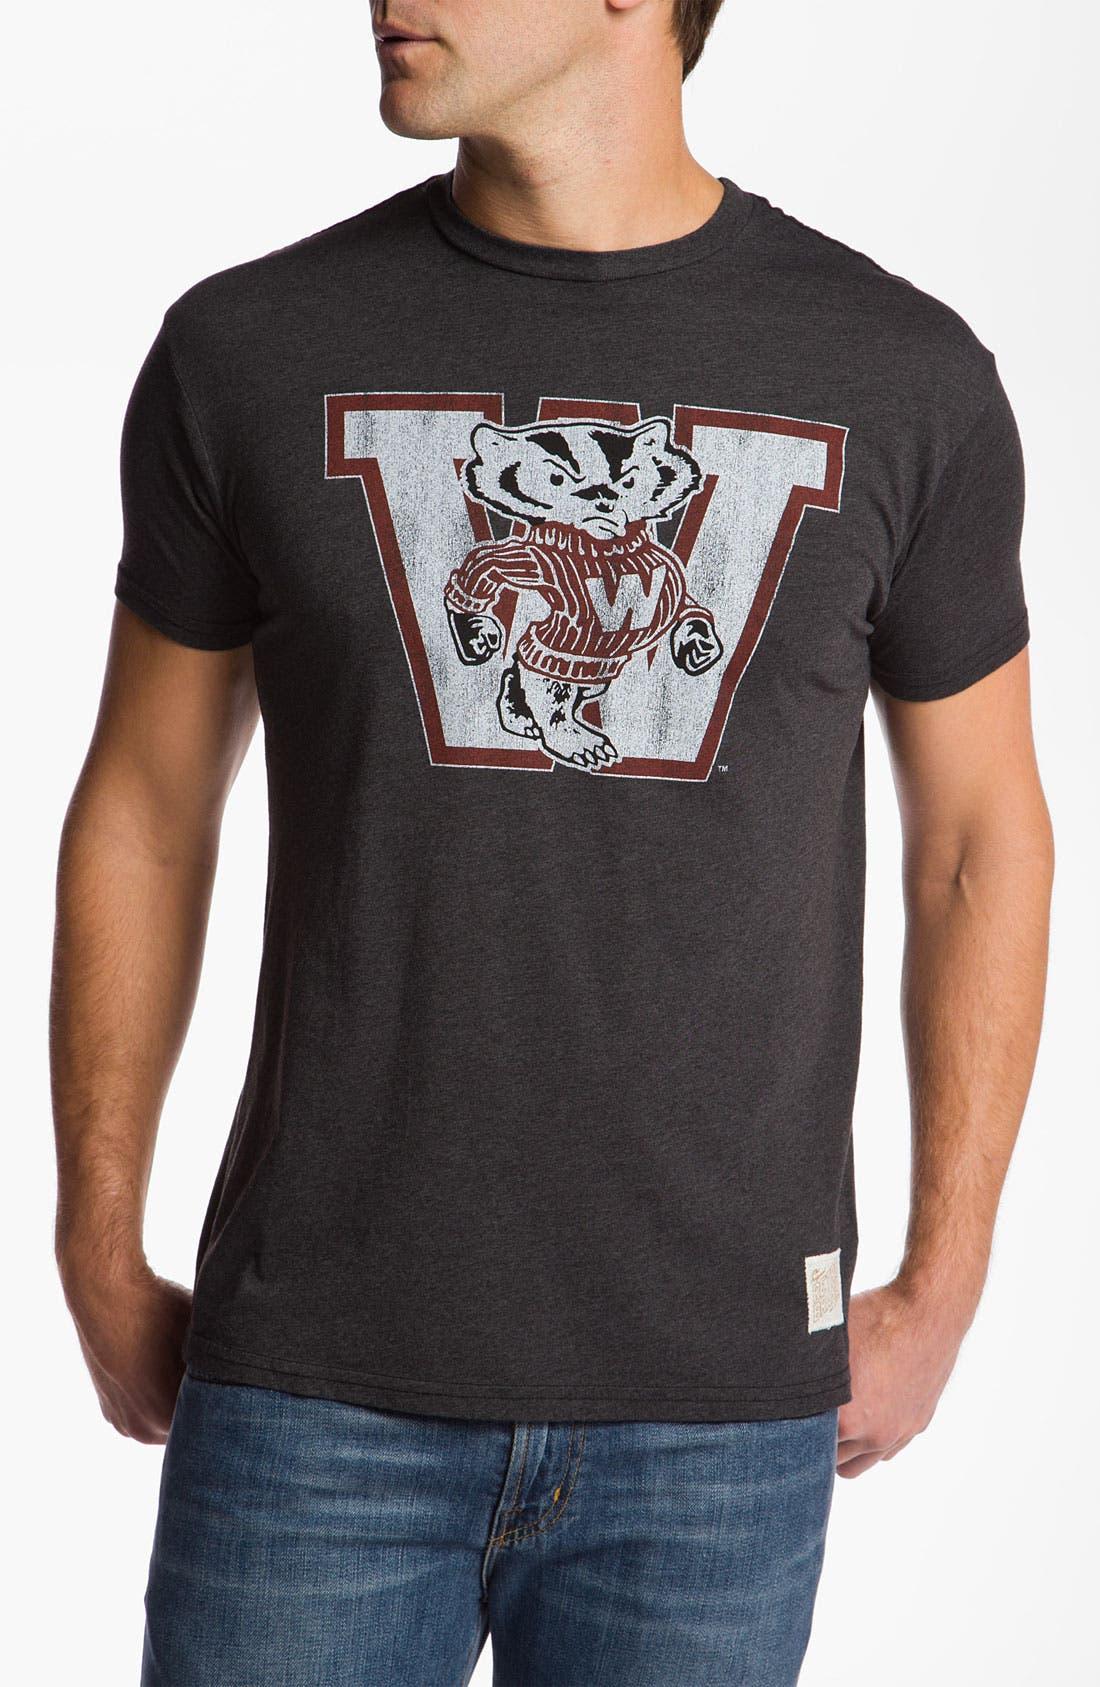 Main Image - The Original Retro Brand 'Wisconsin Badgers' T-Shirt